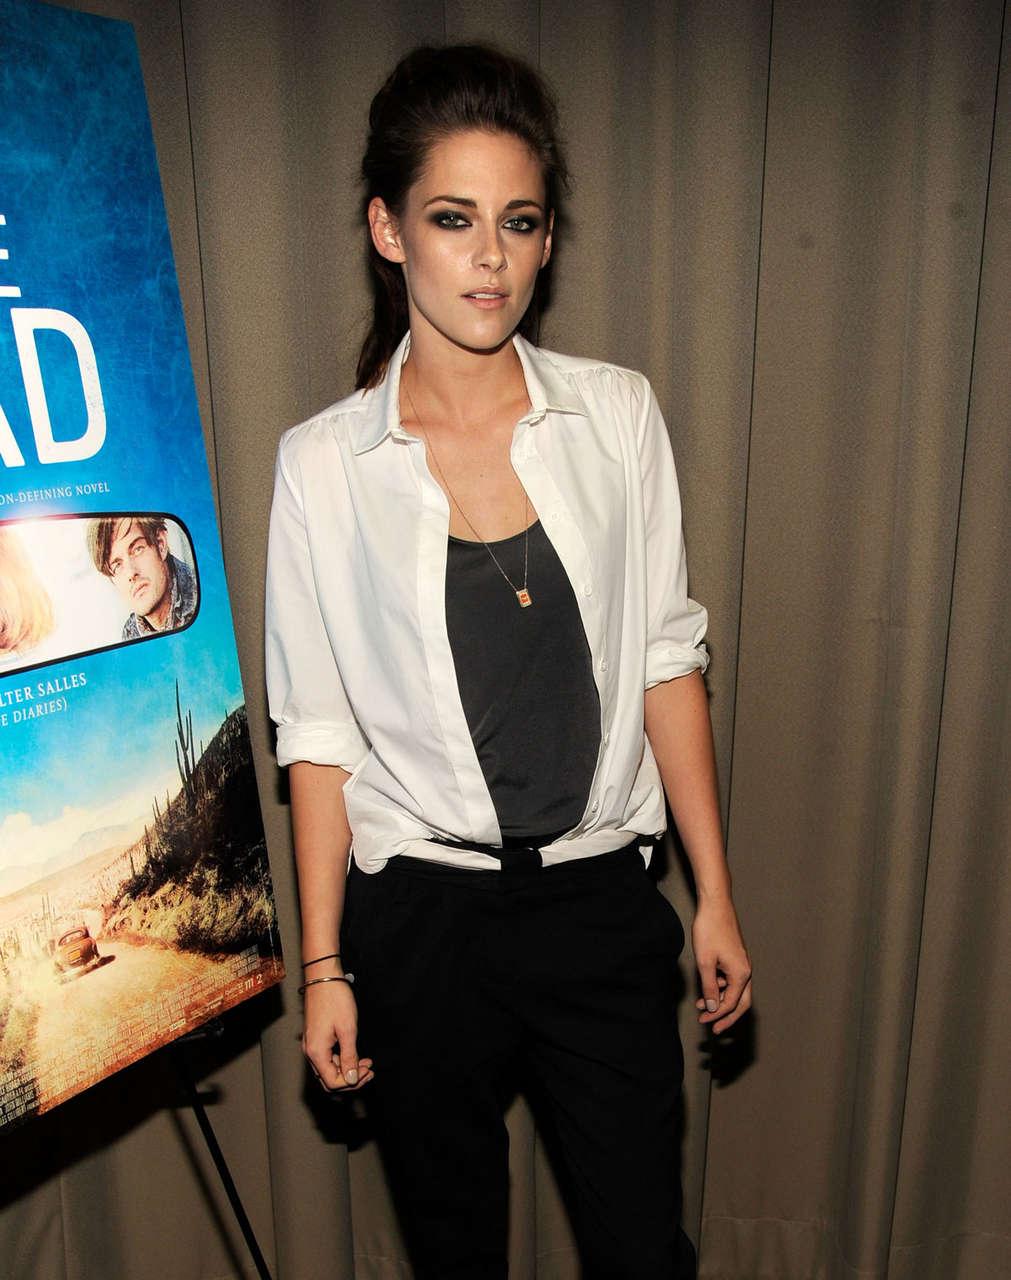 Kristen Stewart Road Screening New York